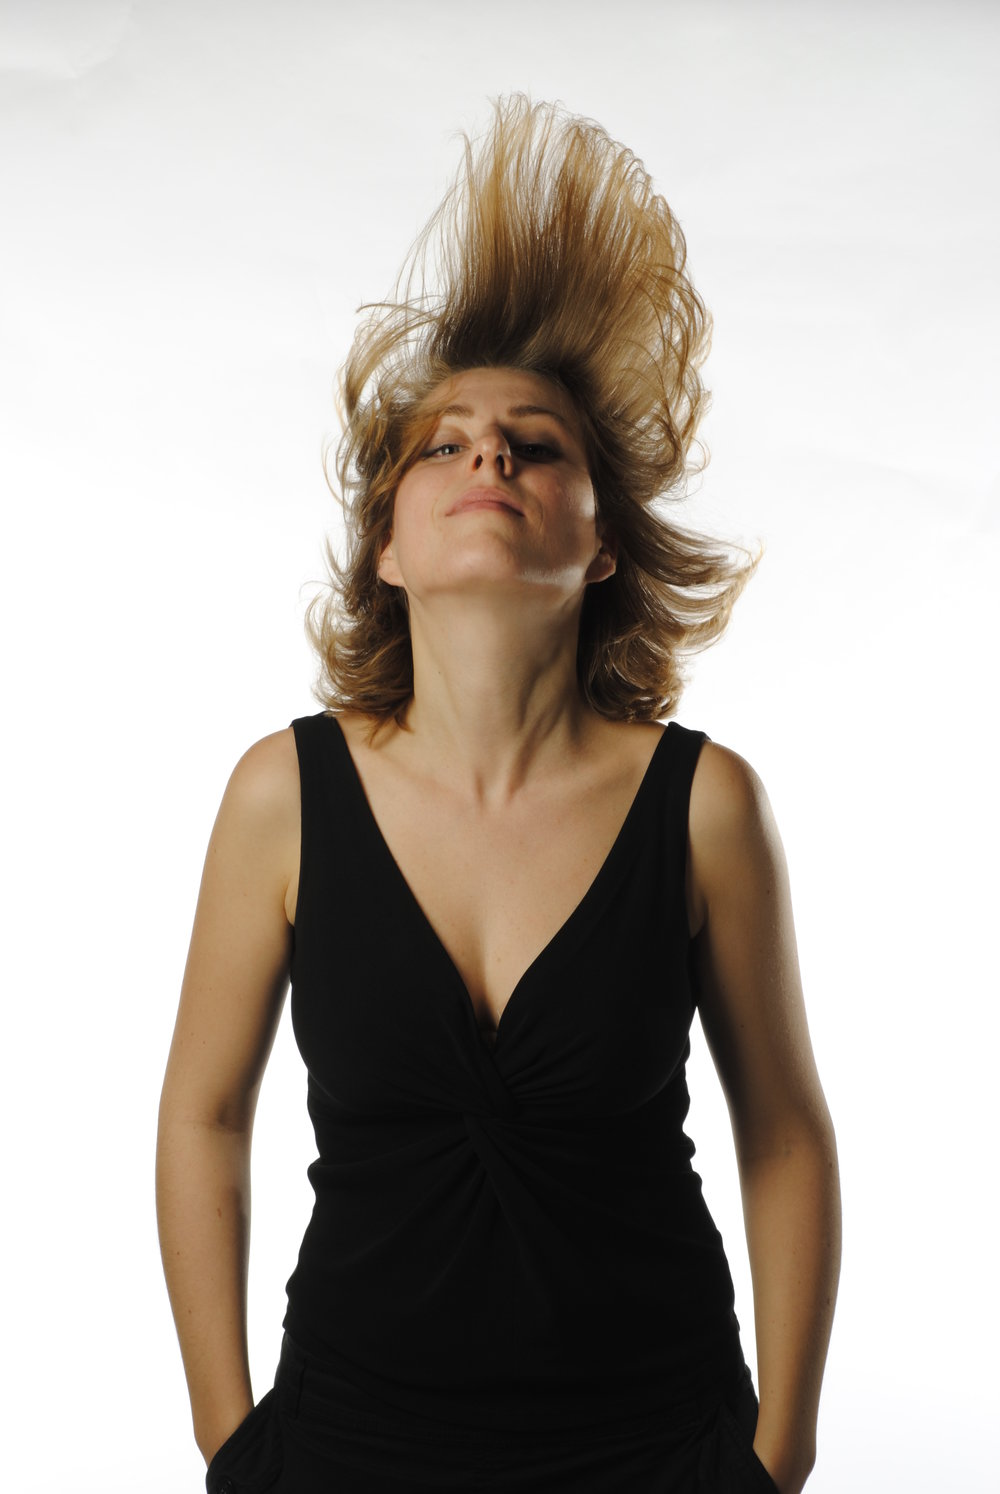 Joanna Wicherek picture.JPG